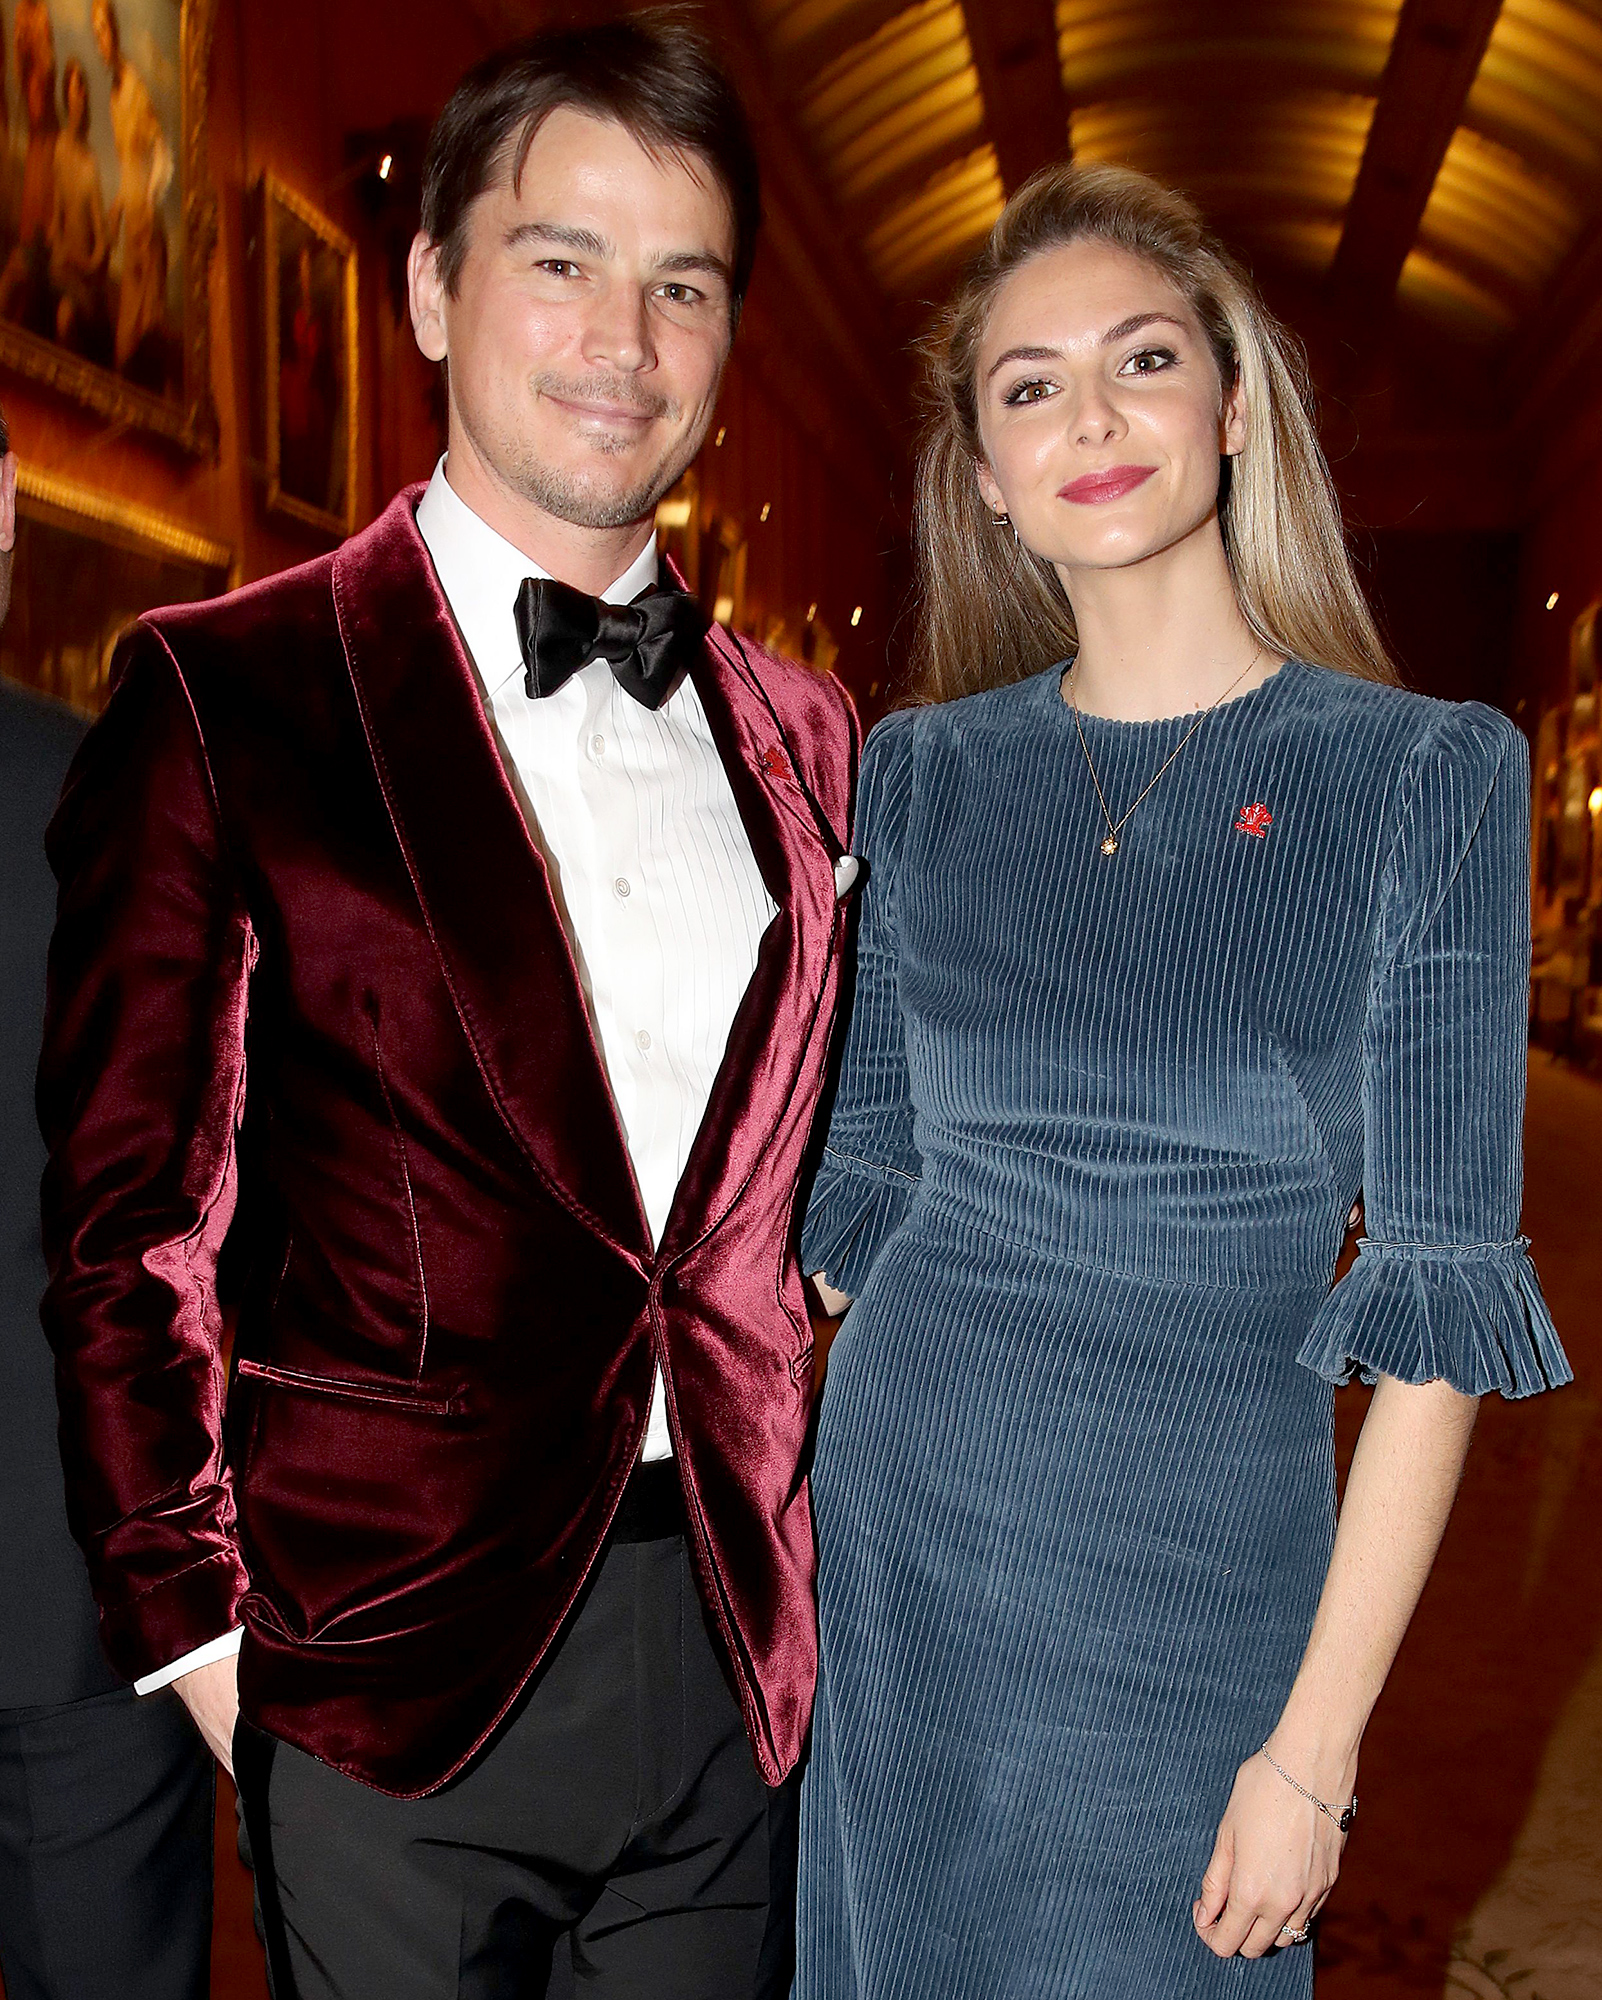 Josh Hartnett Confirms He and Tamsin Egerton Secretly Welcomed 3rd Baby in 2019